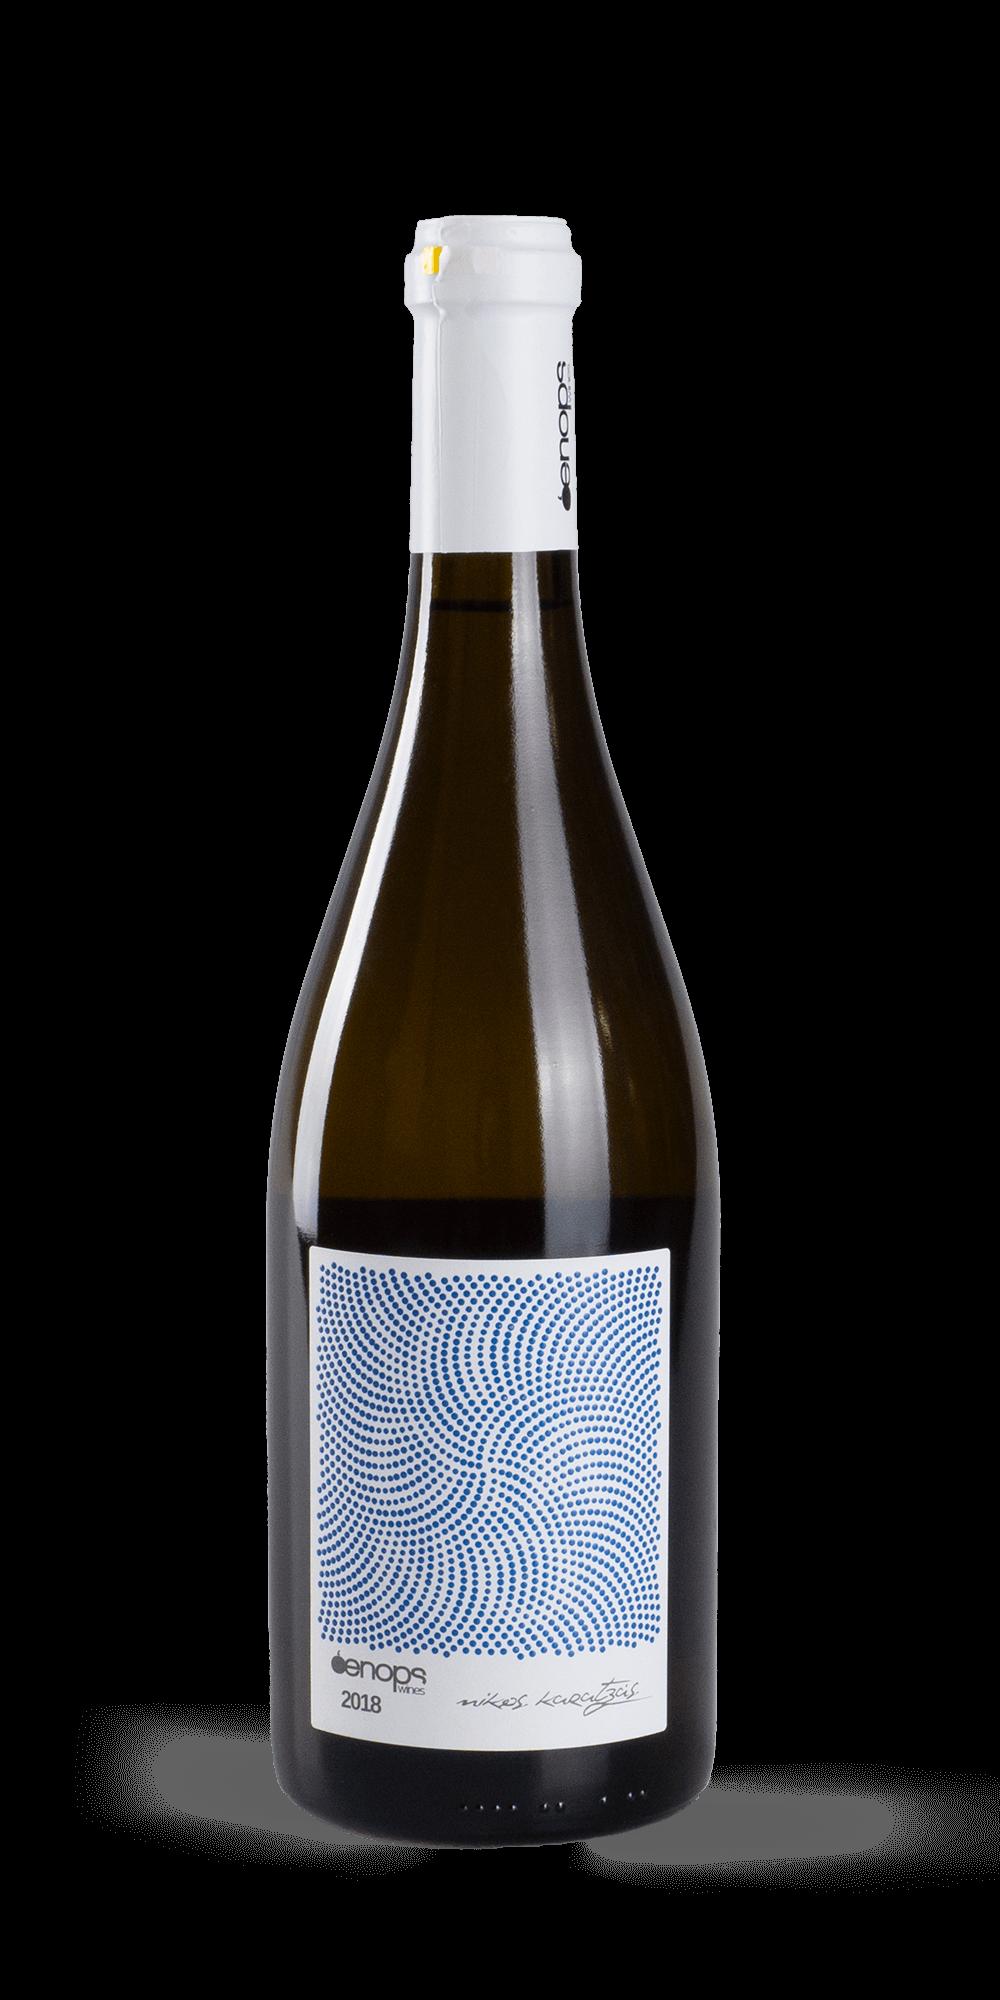 Vidiano 2018 (Oenops Wines)